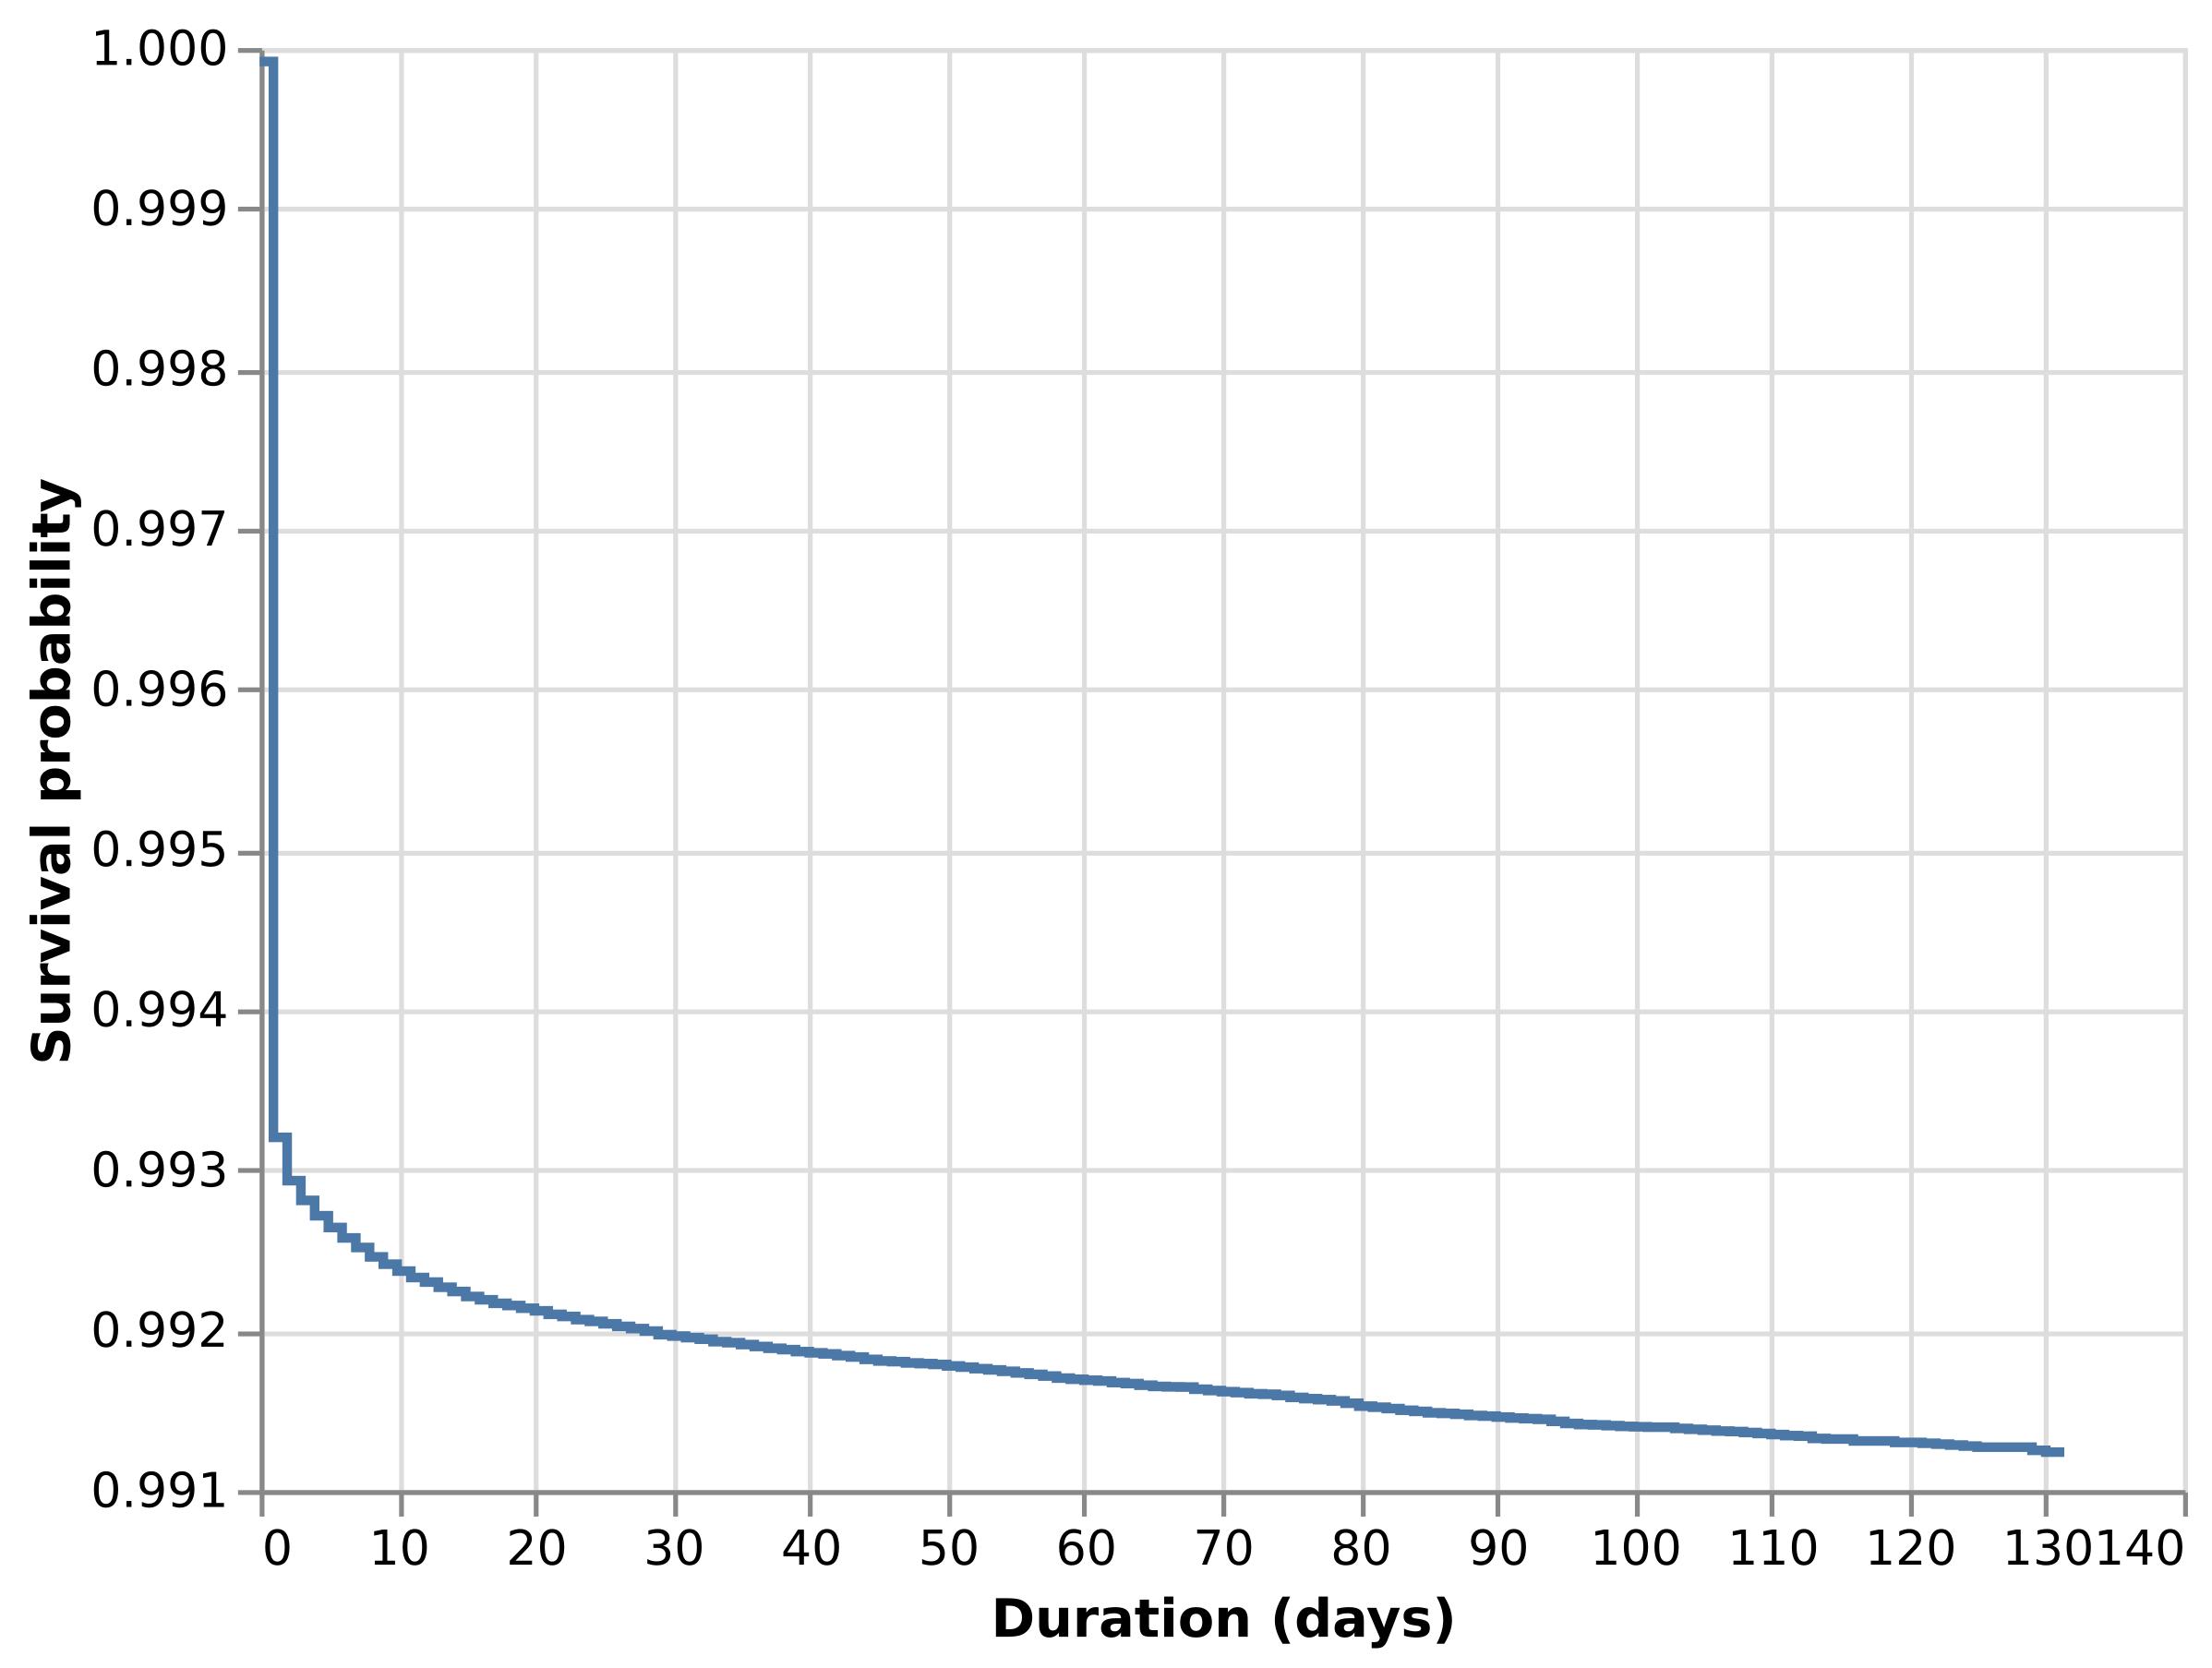 Survival estimate for Retail Rocket data